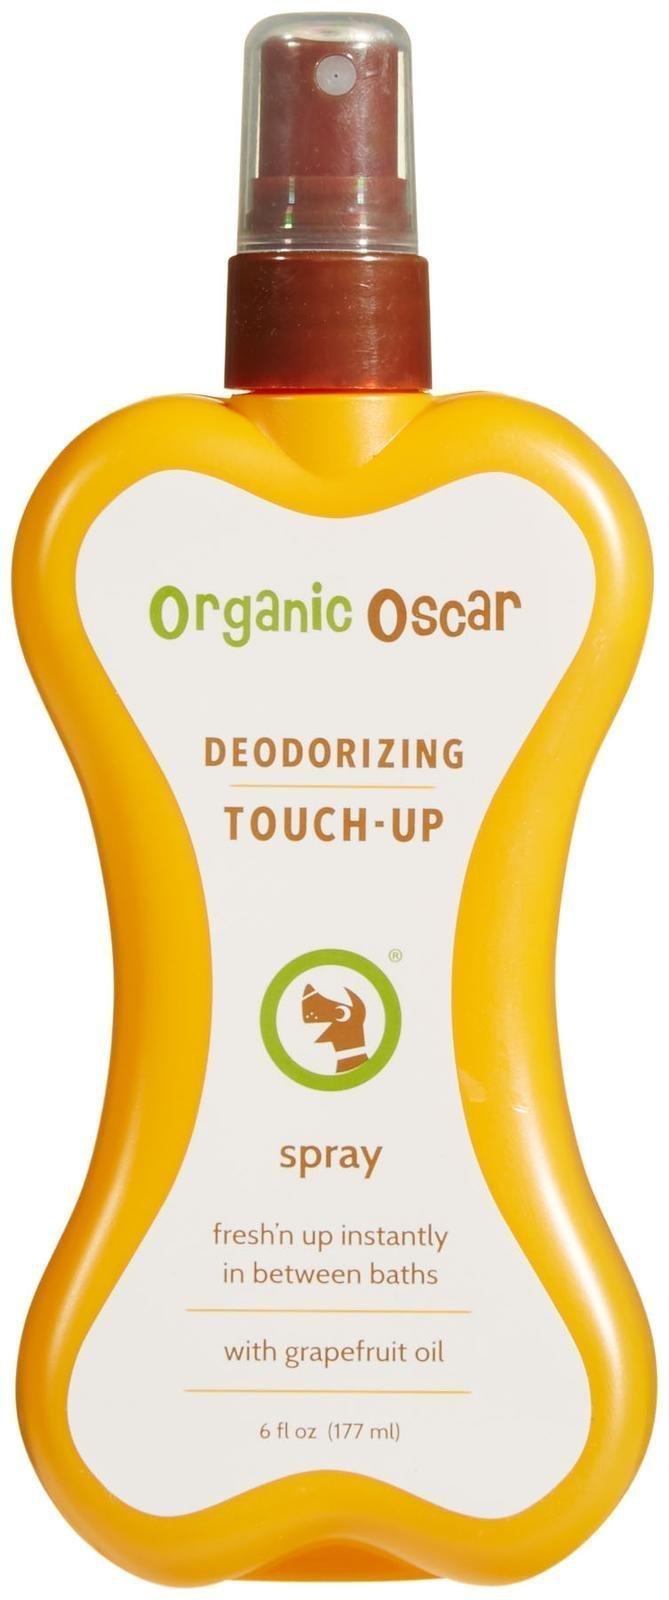 Organic Oscar Deodorizing Touch Up Spray